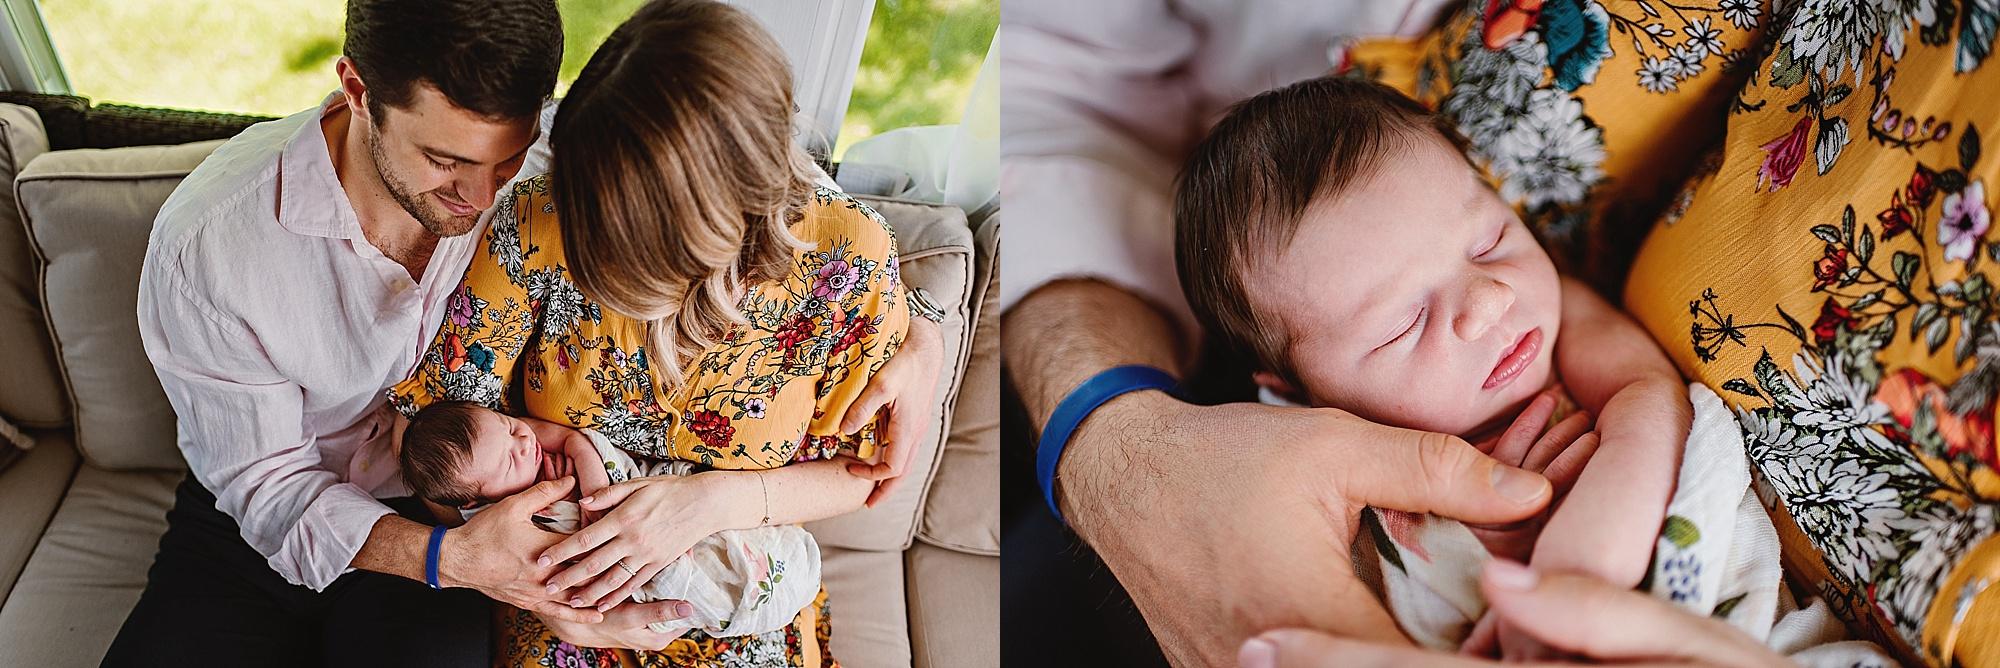 lauren-grayson-photography-cleveland-ohio-photographer-newborn-session-in-home-lifestyle-newborn-family-vivian_0645.jpg